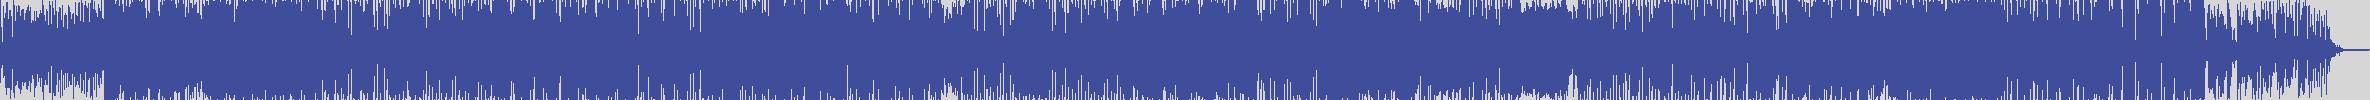 smilax_dig_records [SDR001] Los Insuperables, Gustavo - Devorame Otra Vez [Original Mix] audio wave form